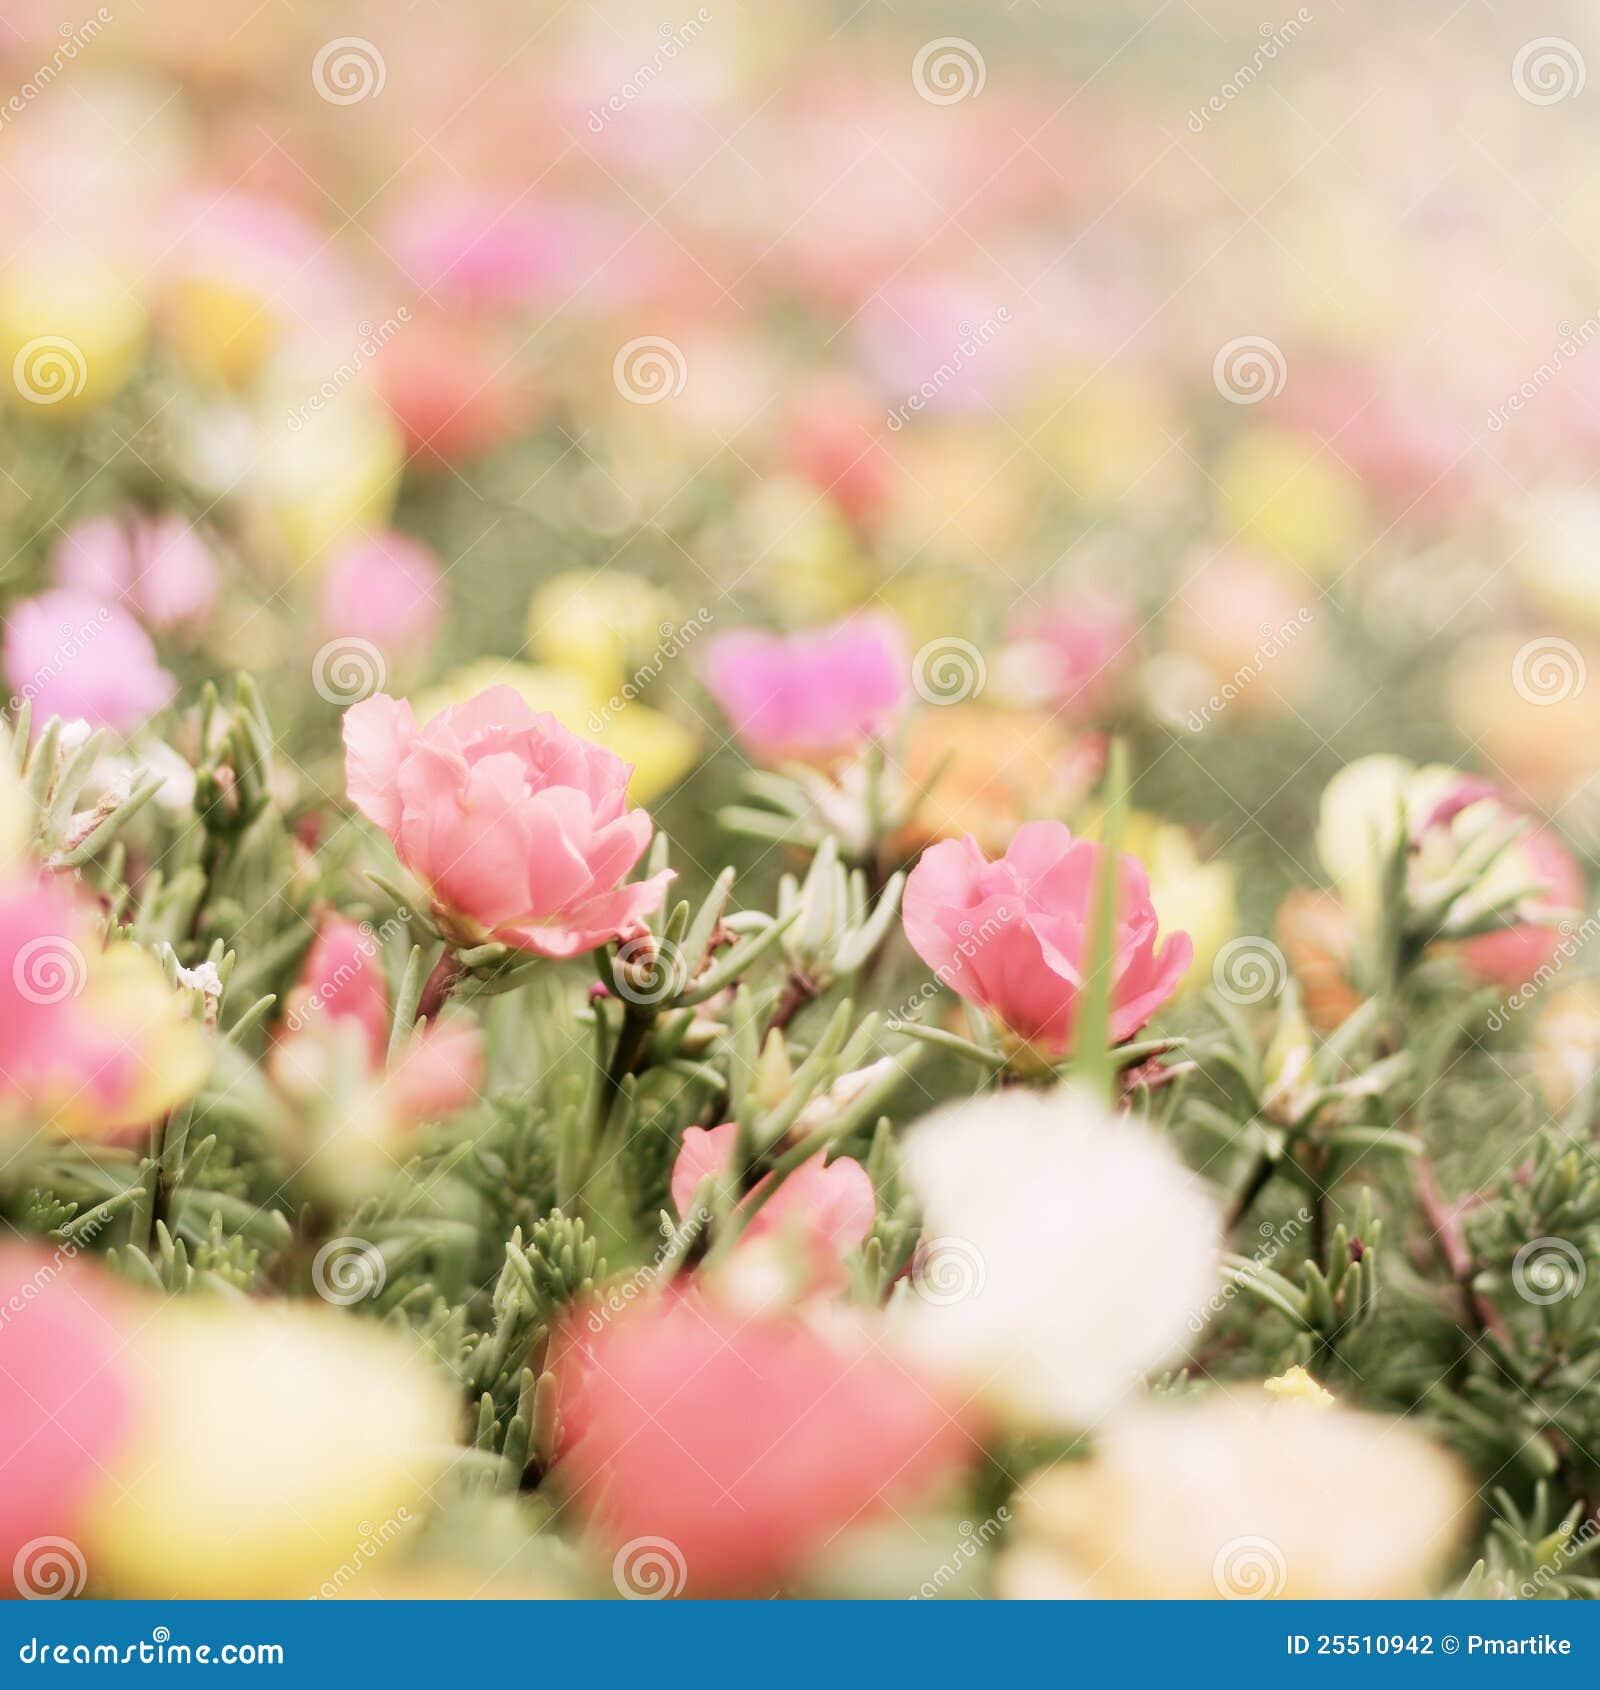 Beautiful pink flowers in the garden stock photography image - Romantic Flower Stock Photography Image 25510942